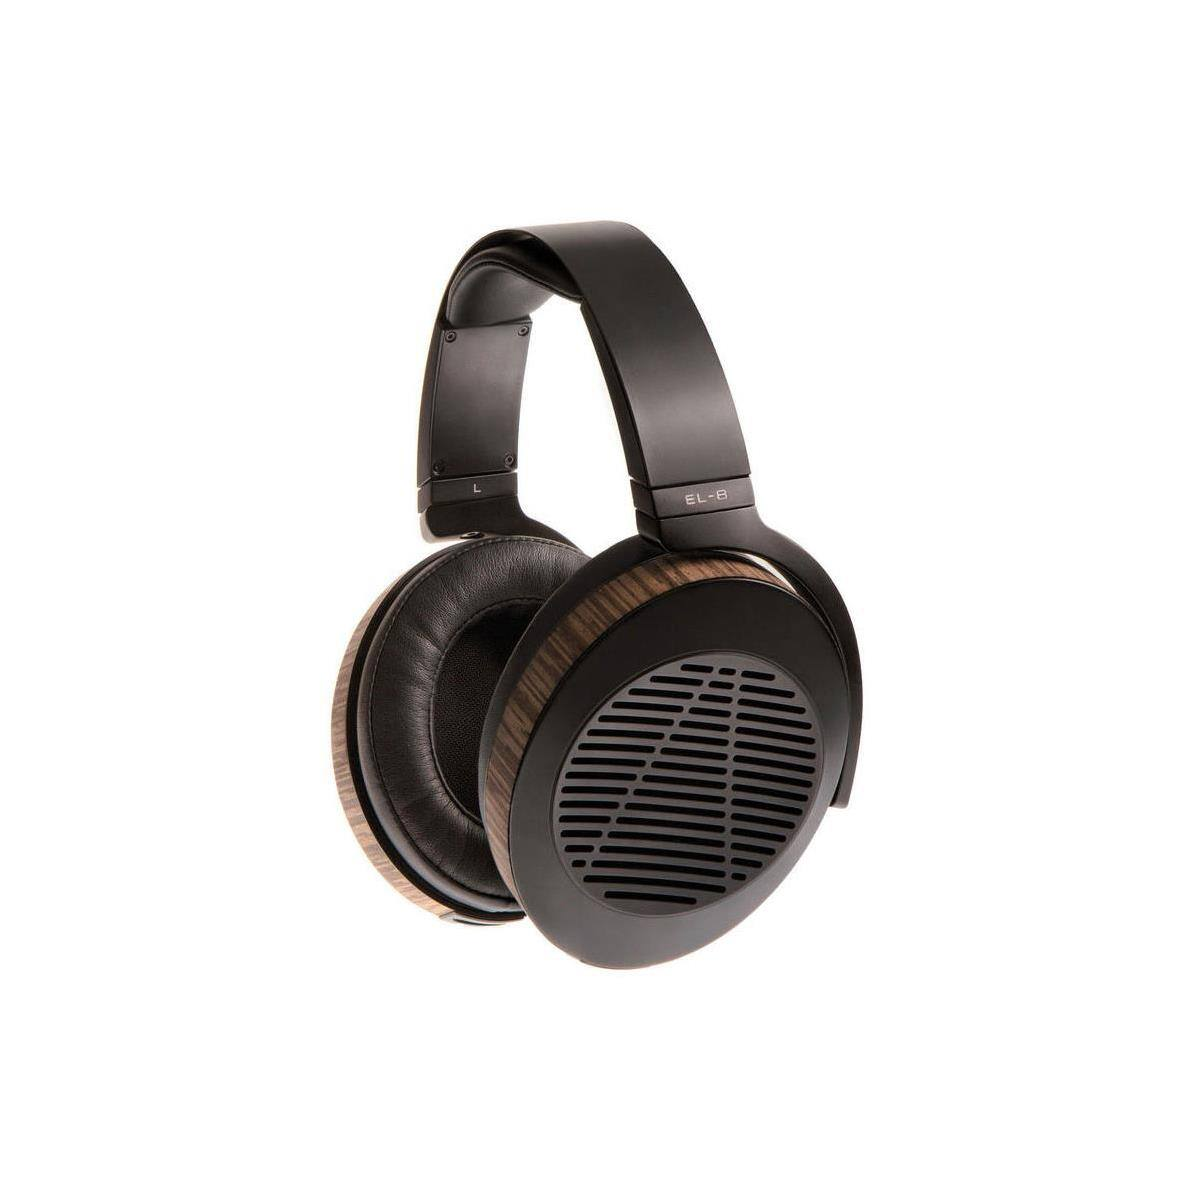 Audeze EL-8 Open Back Planar Magnetic Headphones (Refurbished): $350 + free shipping